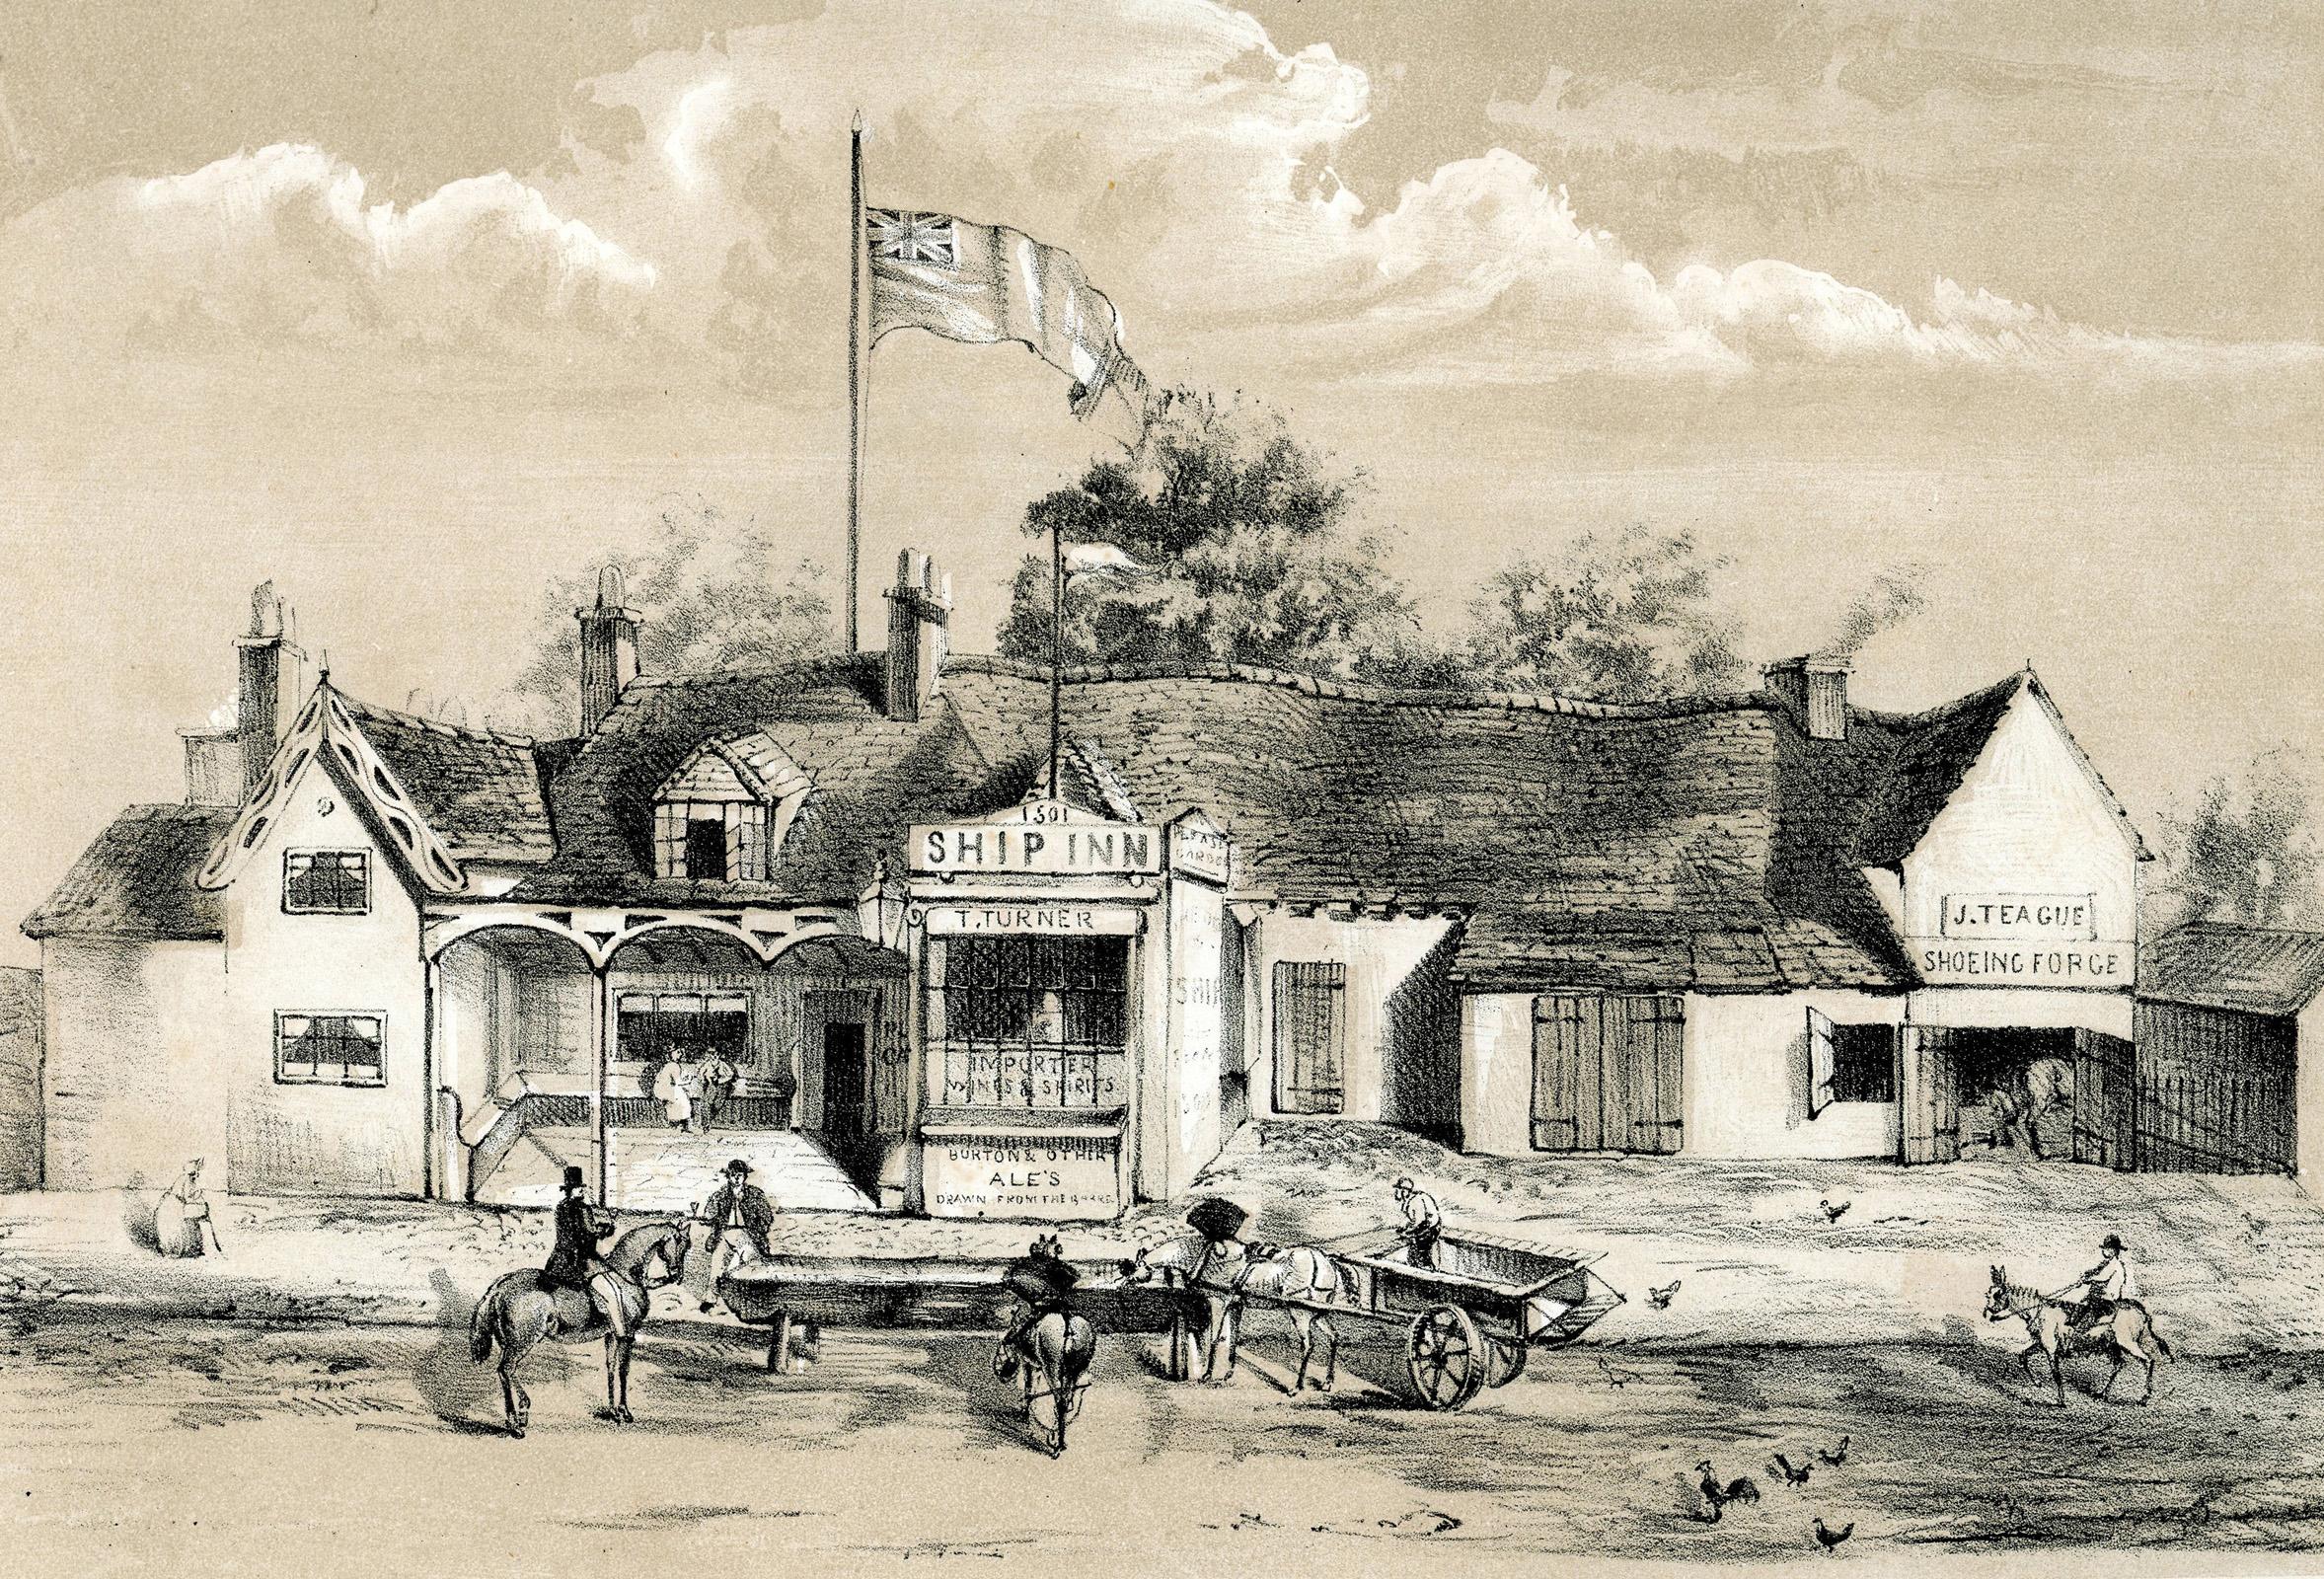 The Old Ship Inn - Camp Hill